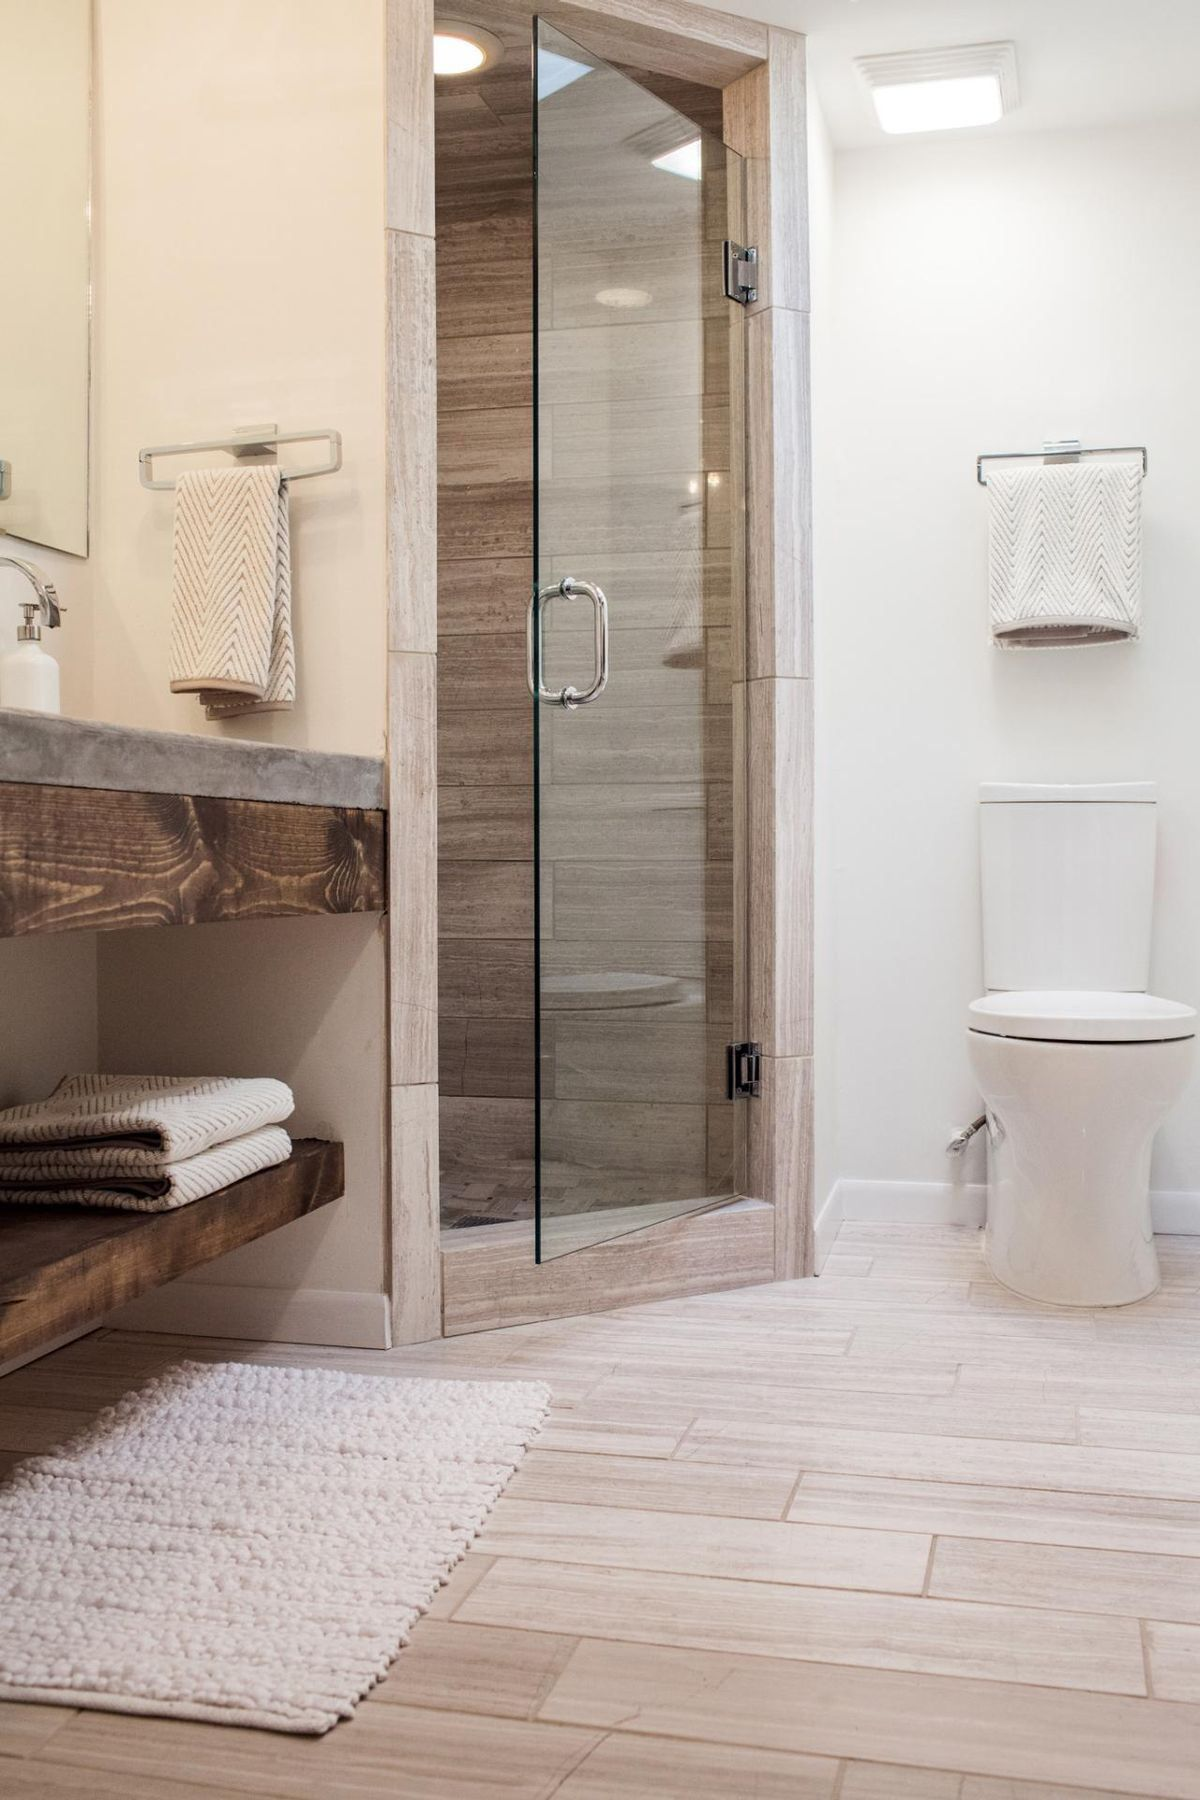 Pin By Natalie Garza Style On Creation Utiles Decoration De Toutes Sortes Small Bathroom Remodel Bathroom Remodel Master Small Master Bathroom